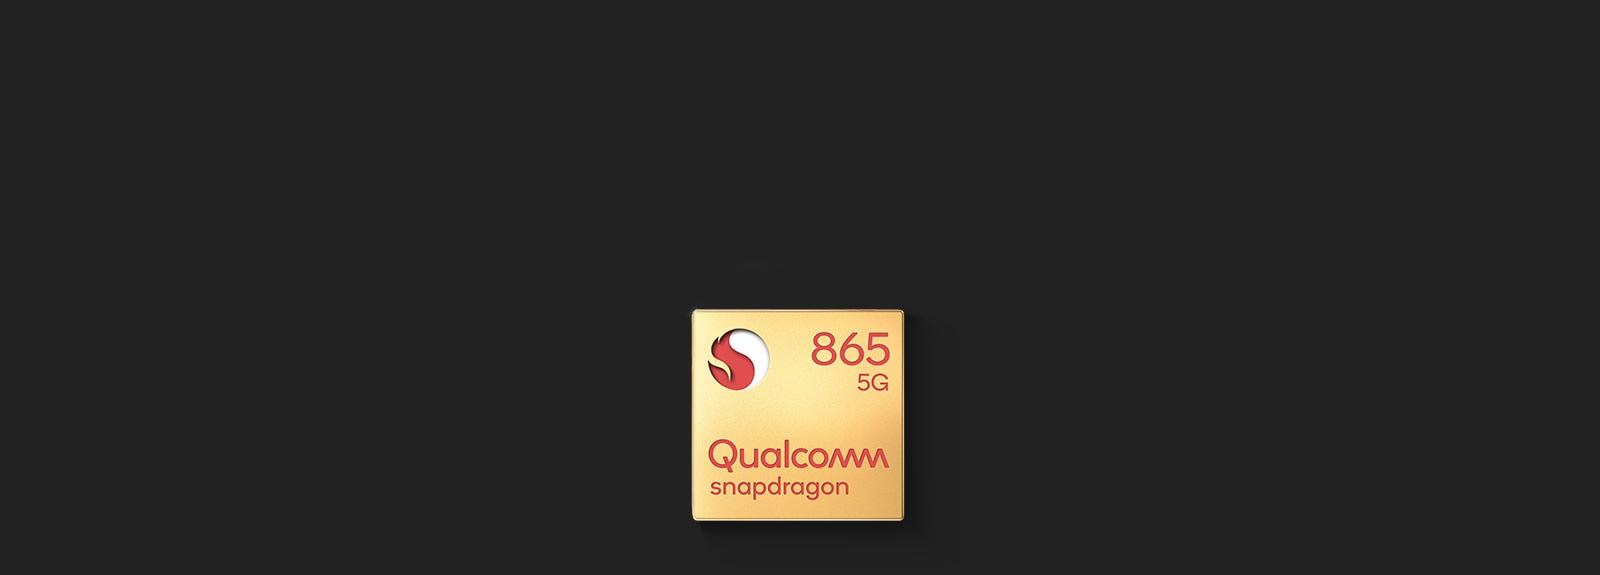 Imagen de la insignia 5G de Qualcomm® Snapdragon ™ 865